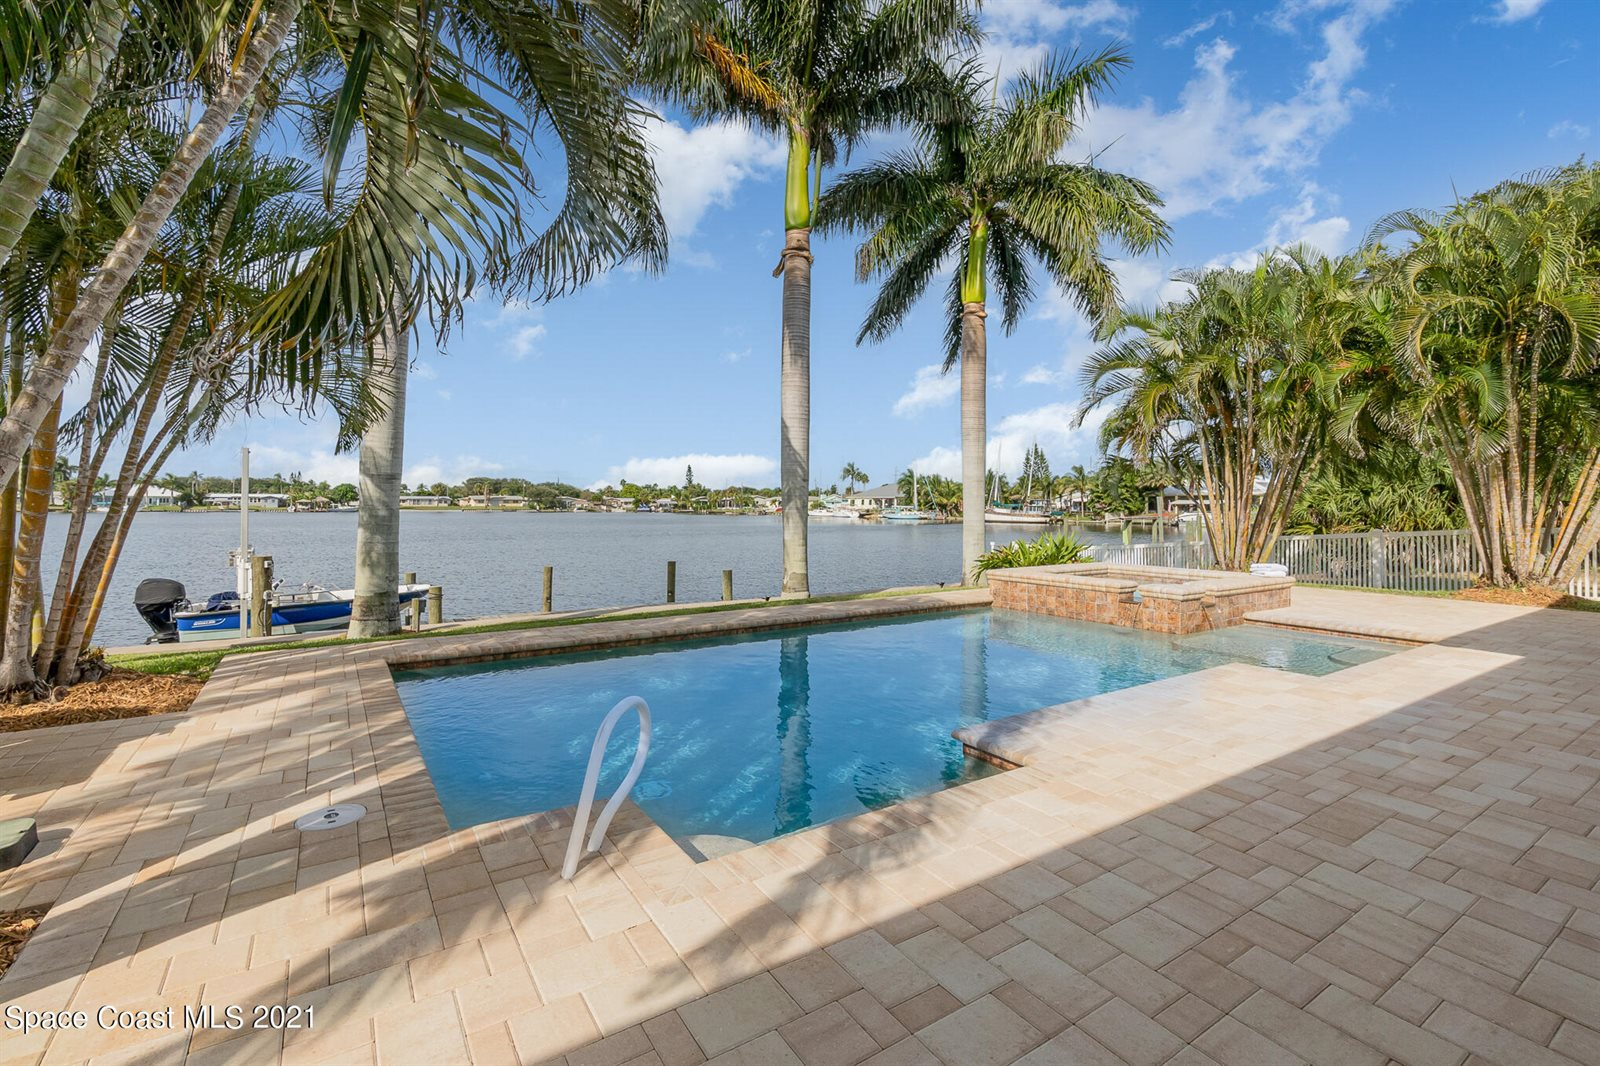 428 South Waterway Drive, Satellite Beach, FL 32937